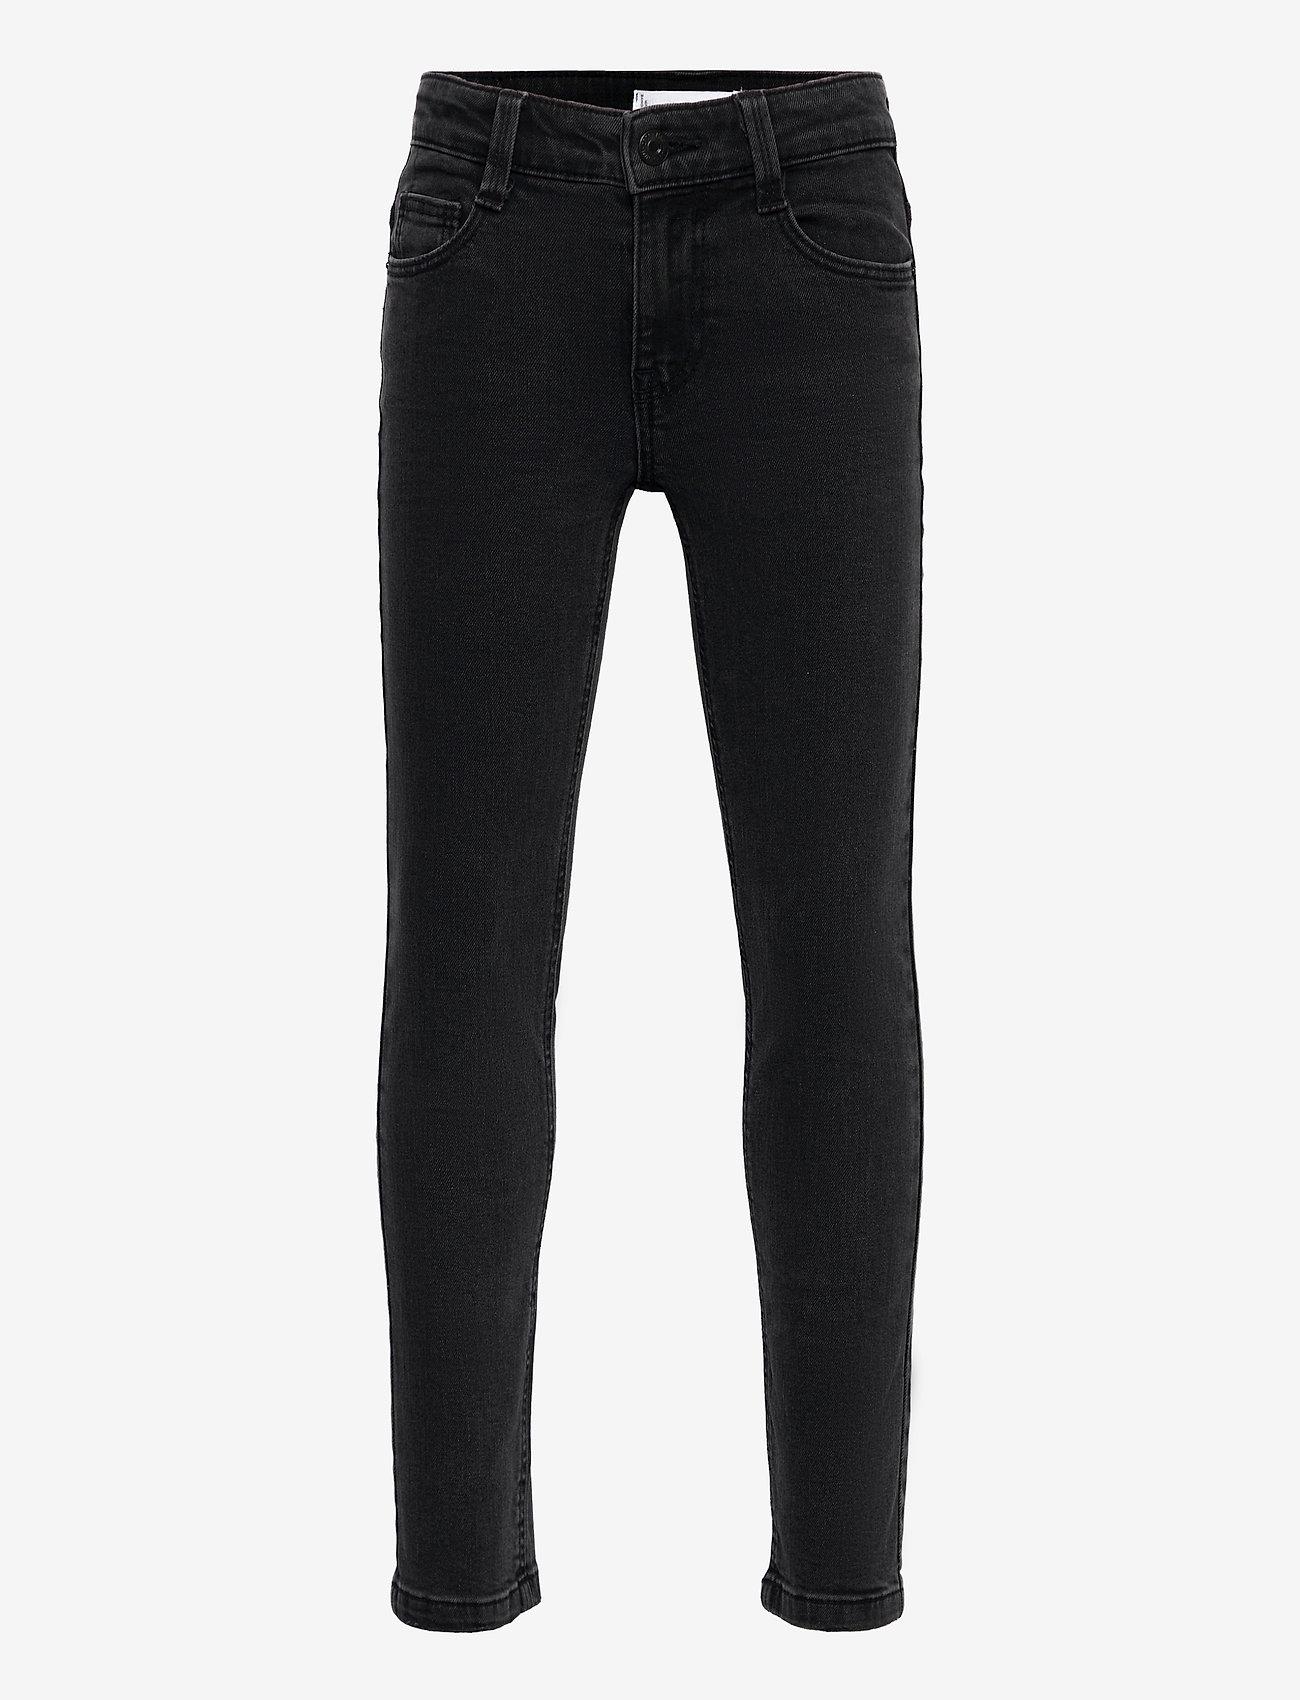 Mango - SLIM8 - jeans - open gray - 0